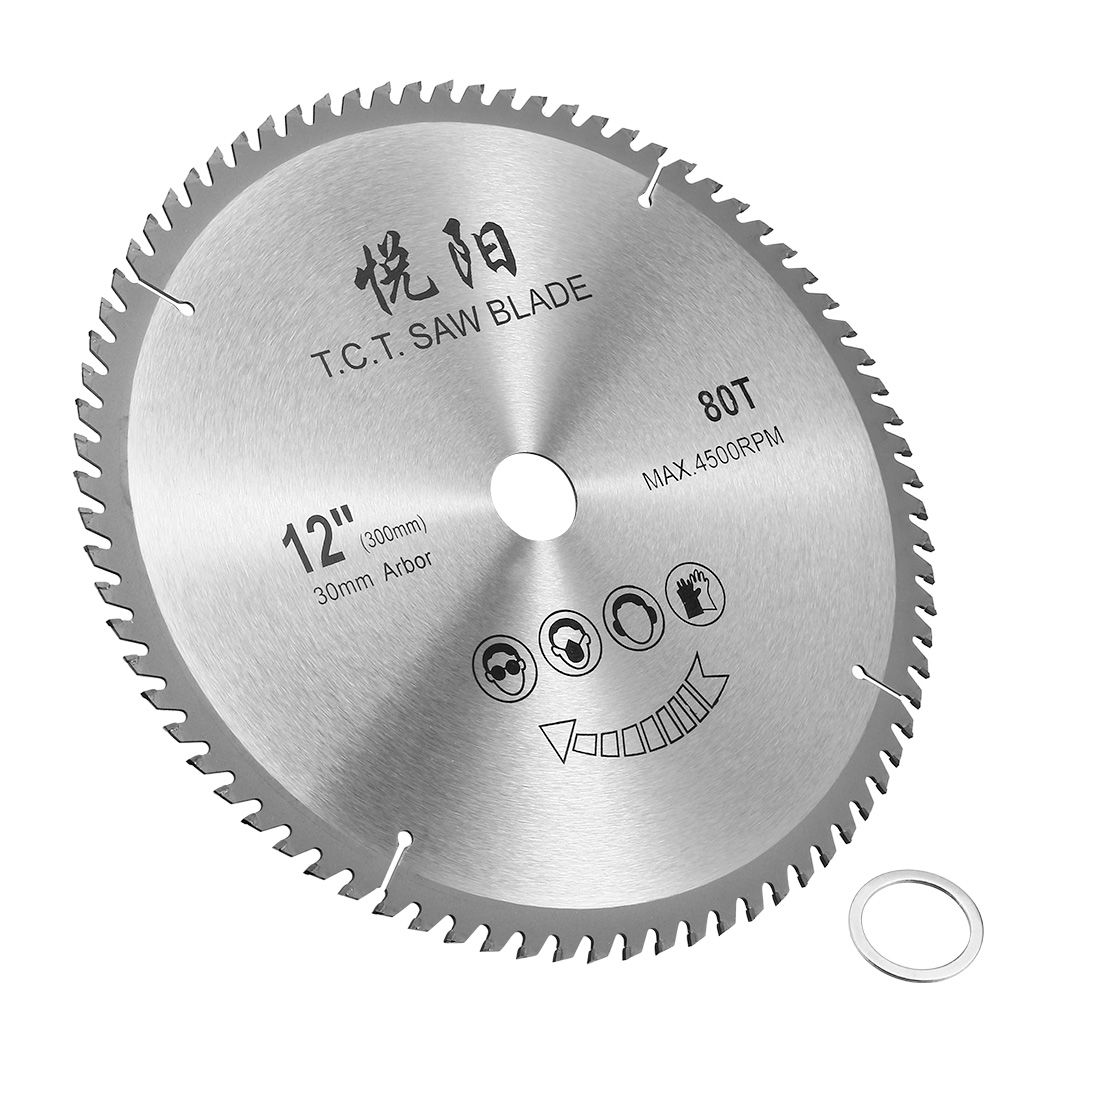 Unique Bargains 12-Inch 80 Tooth 4500RPM Carbide Tip Cutting Circular Saw Blade w 30mm Arbor - image 4 de 4